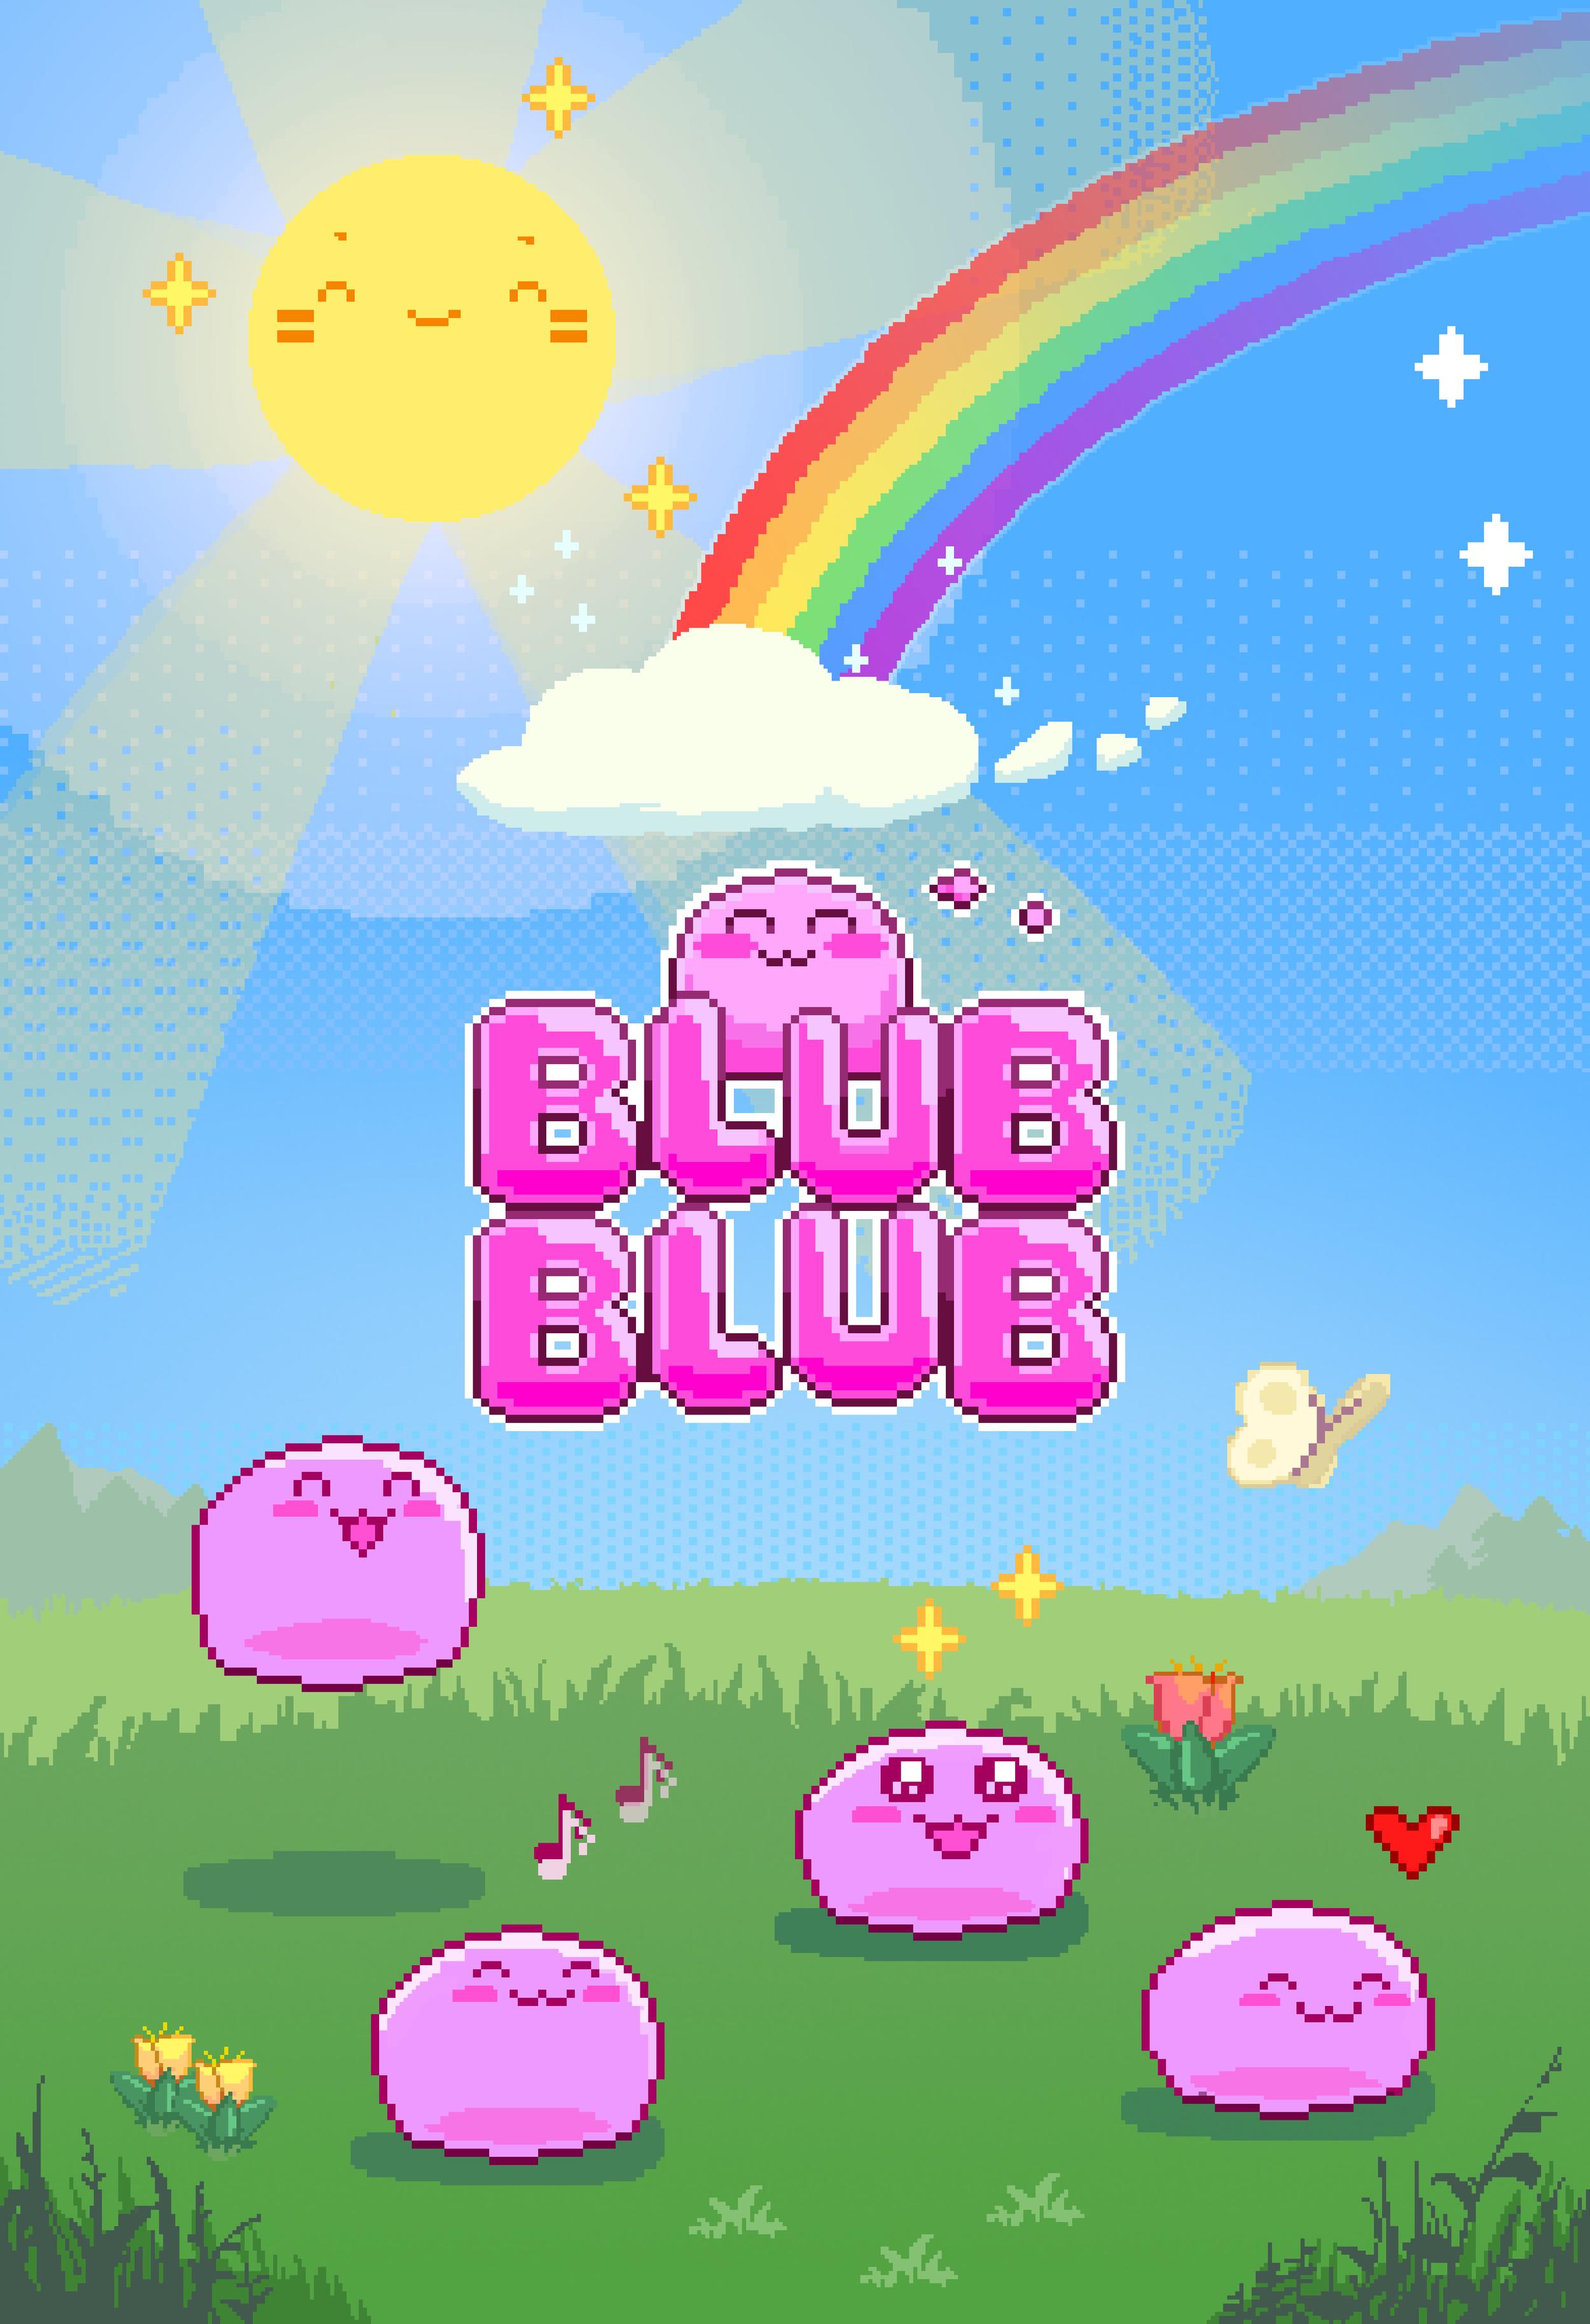 blub (1).png